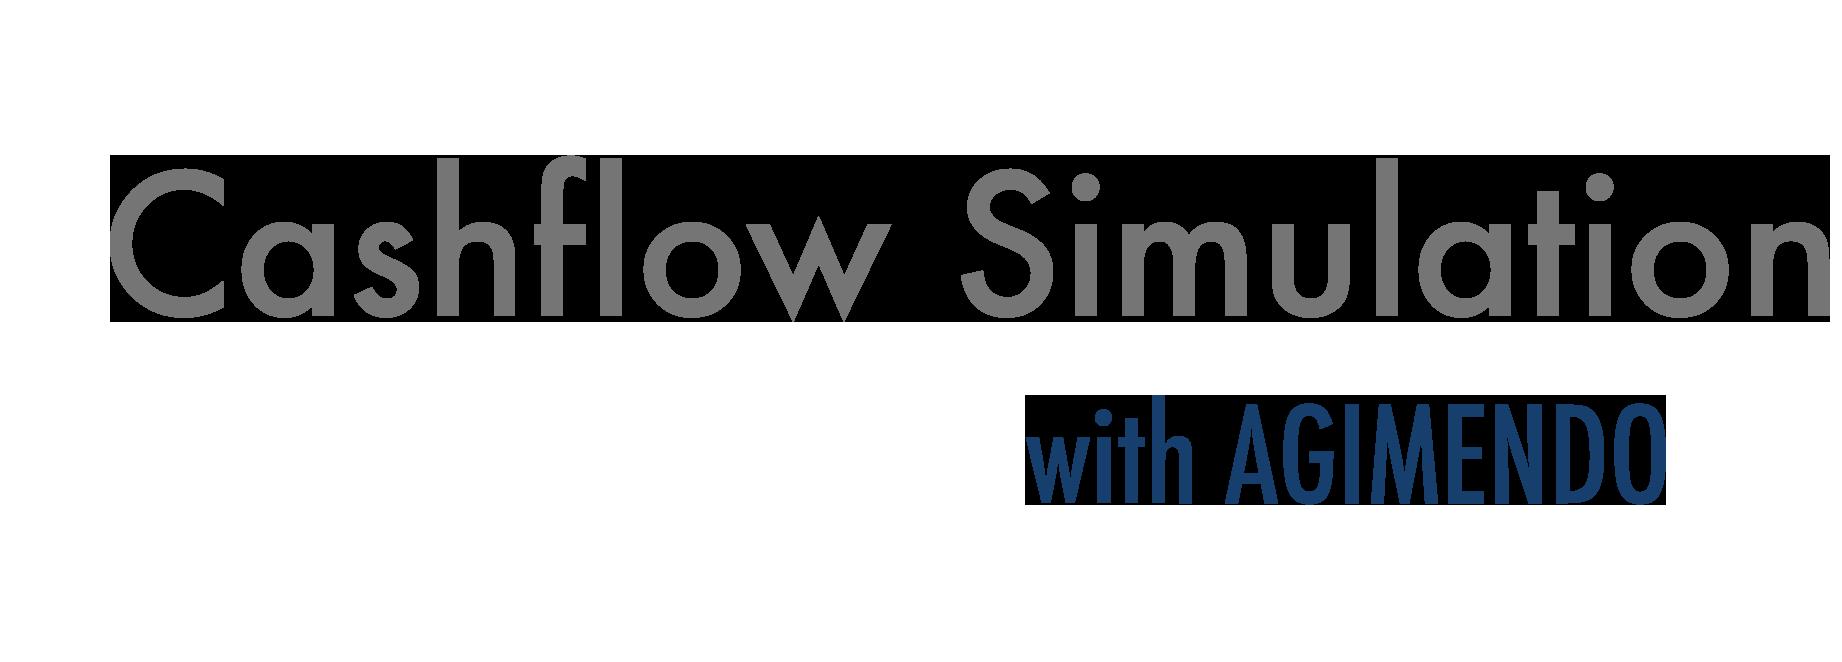 AGIMENDO.lösungen_cash-flow-simulation